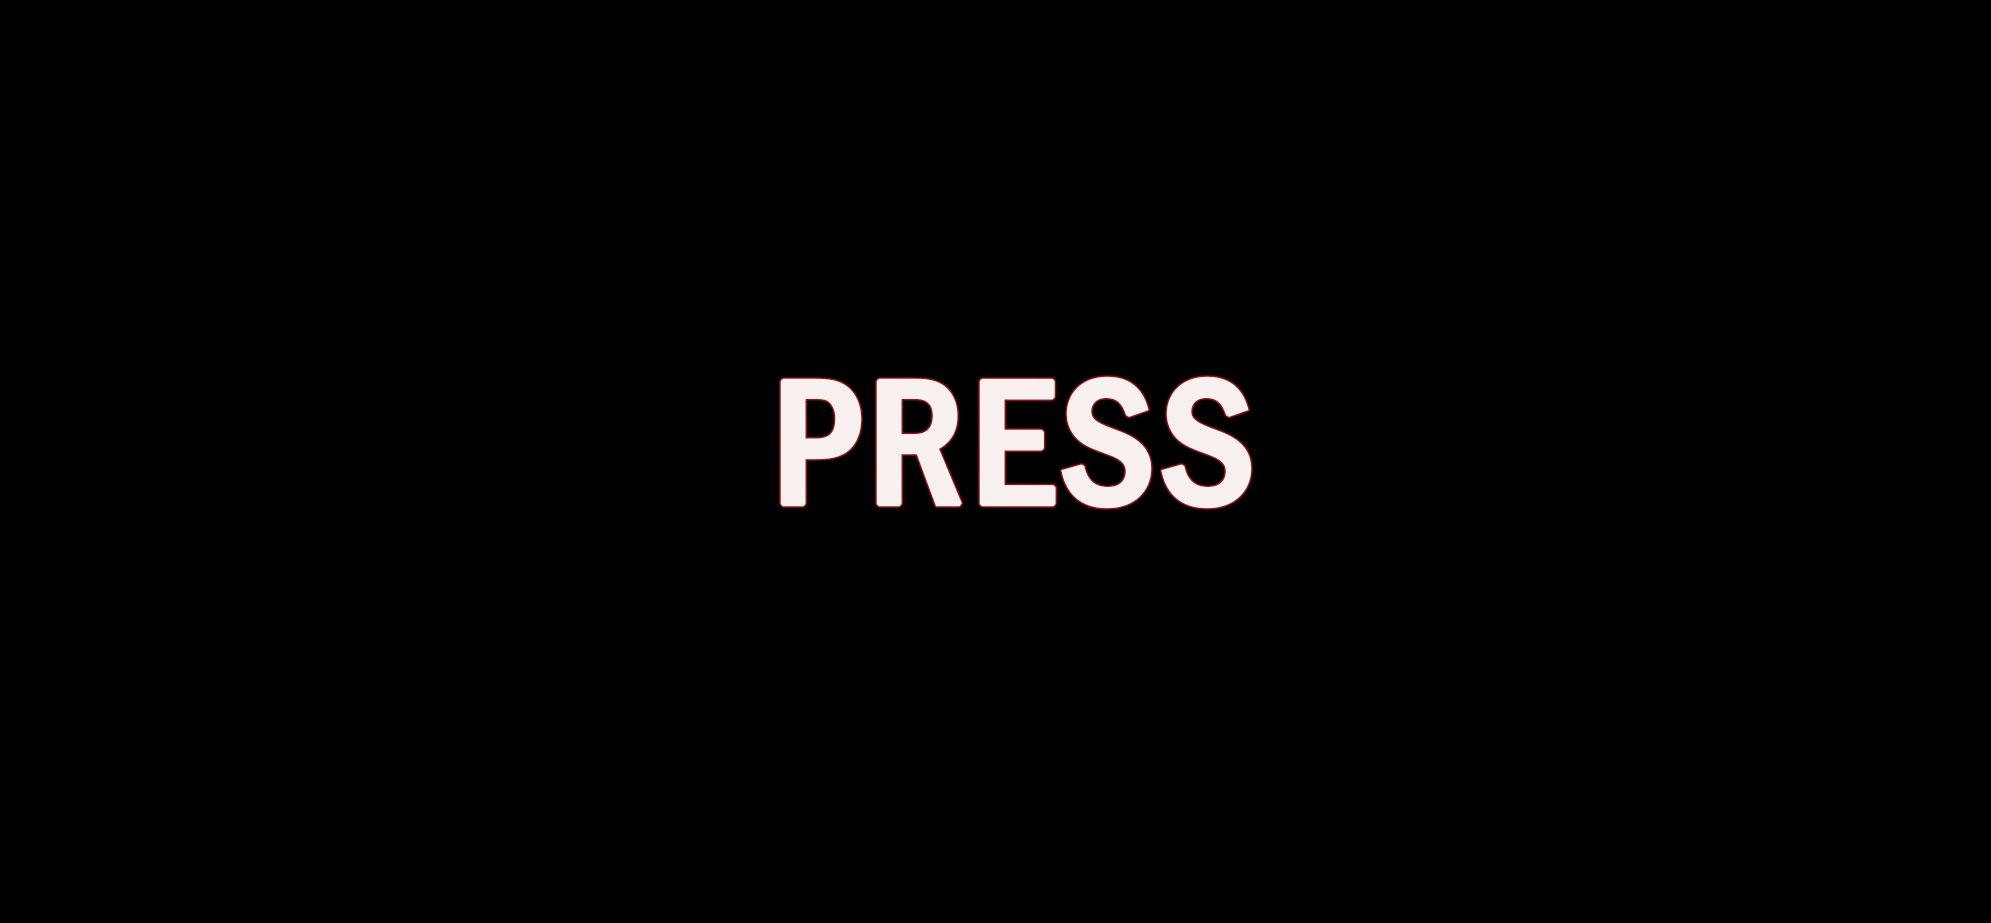 pressss.jpg